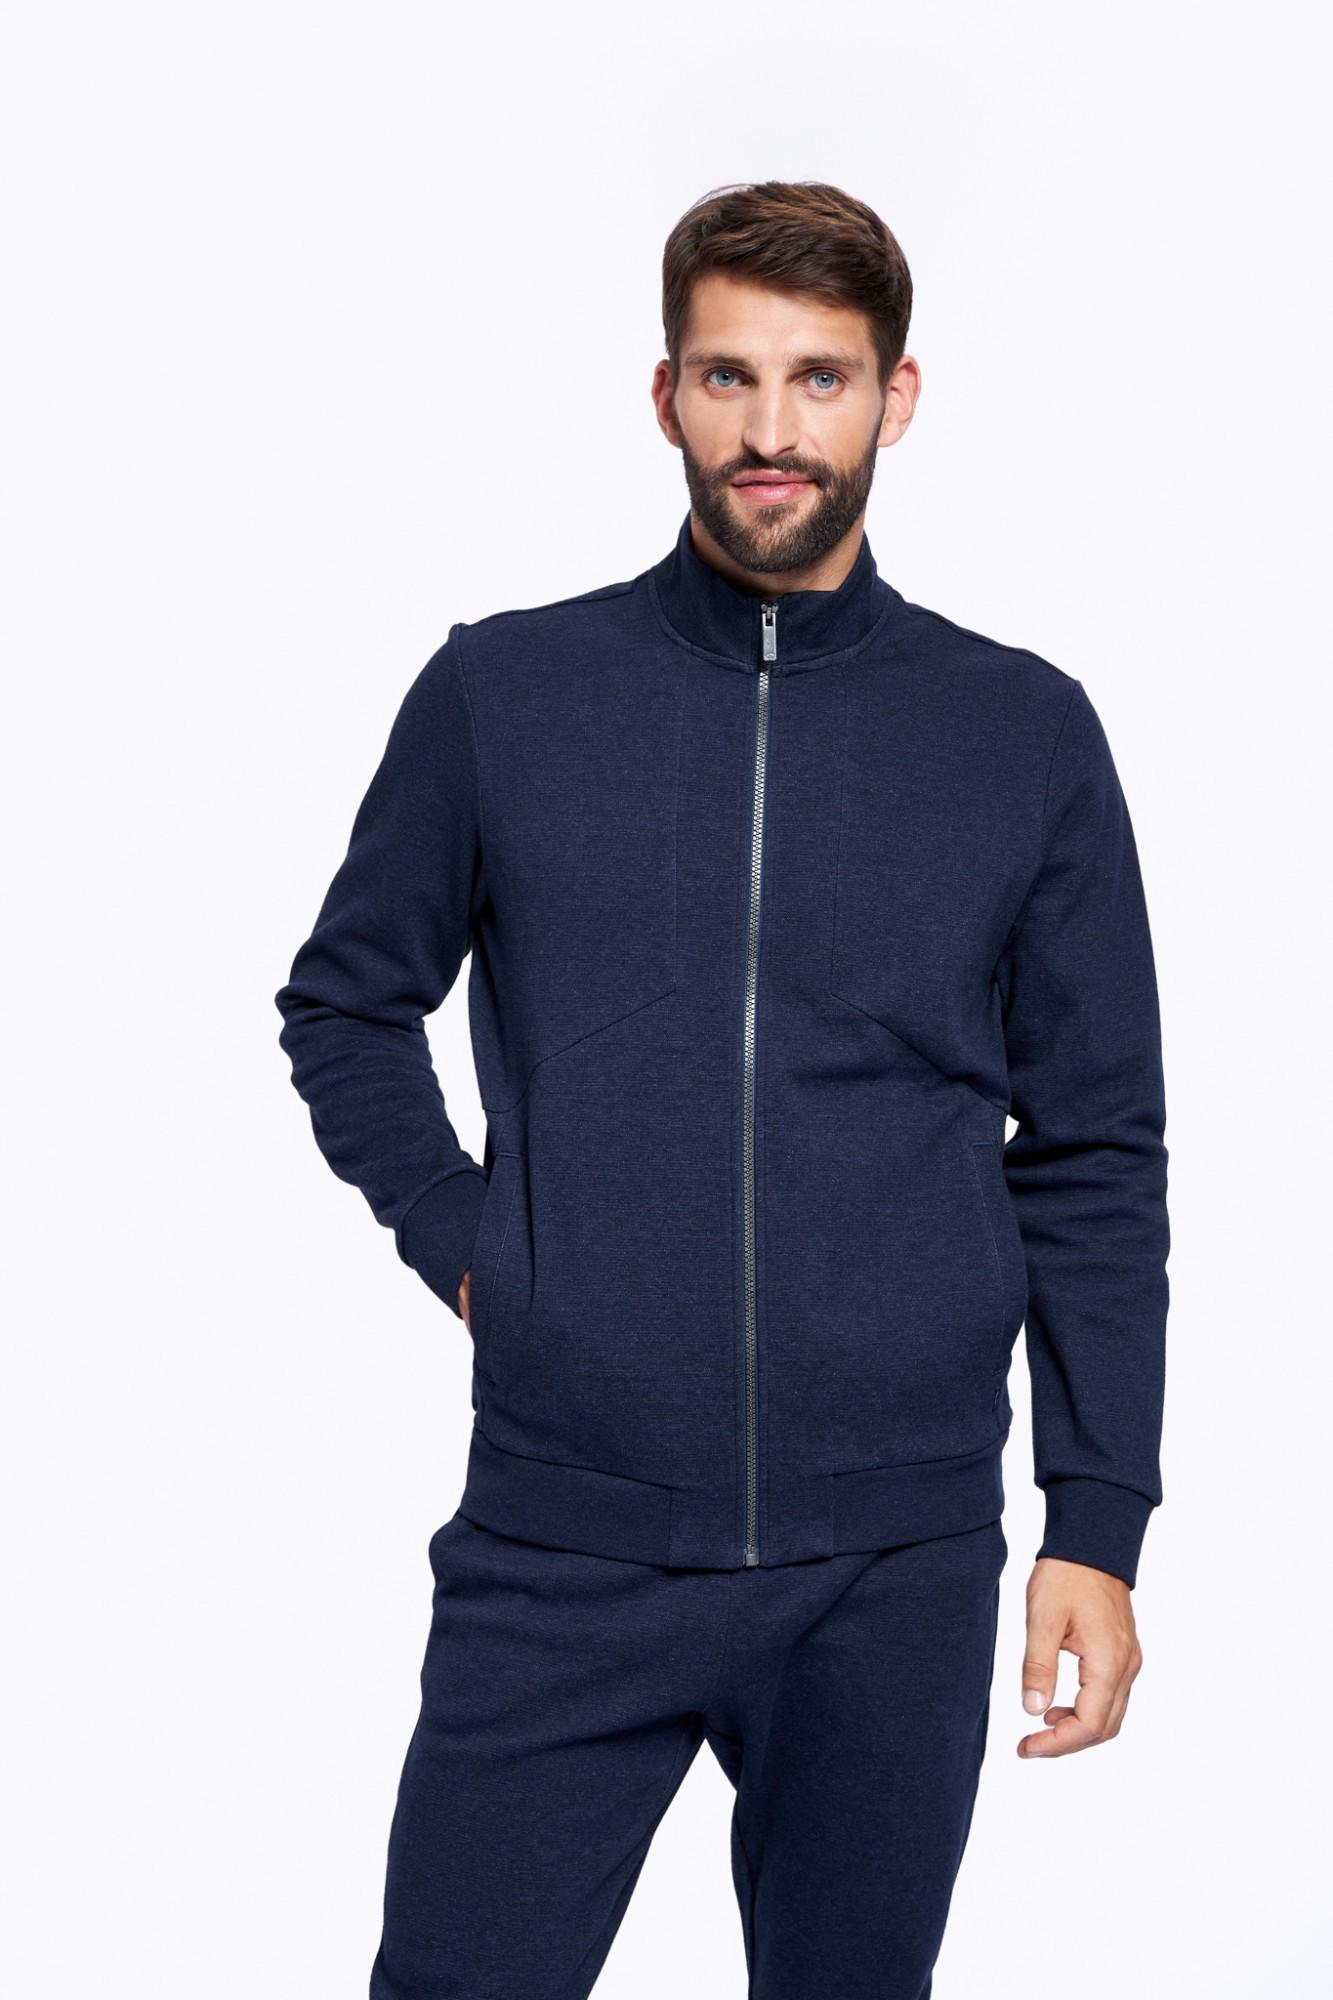 AUDIMAS Atsegamas medvilninis džemperis 2121-461 Navy Blazer Melange S